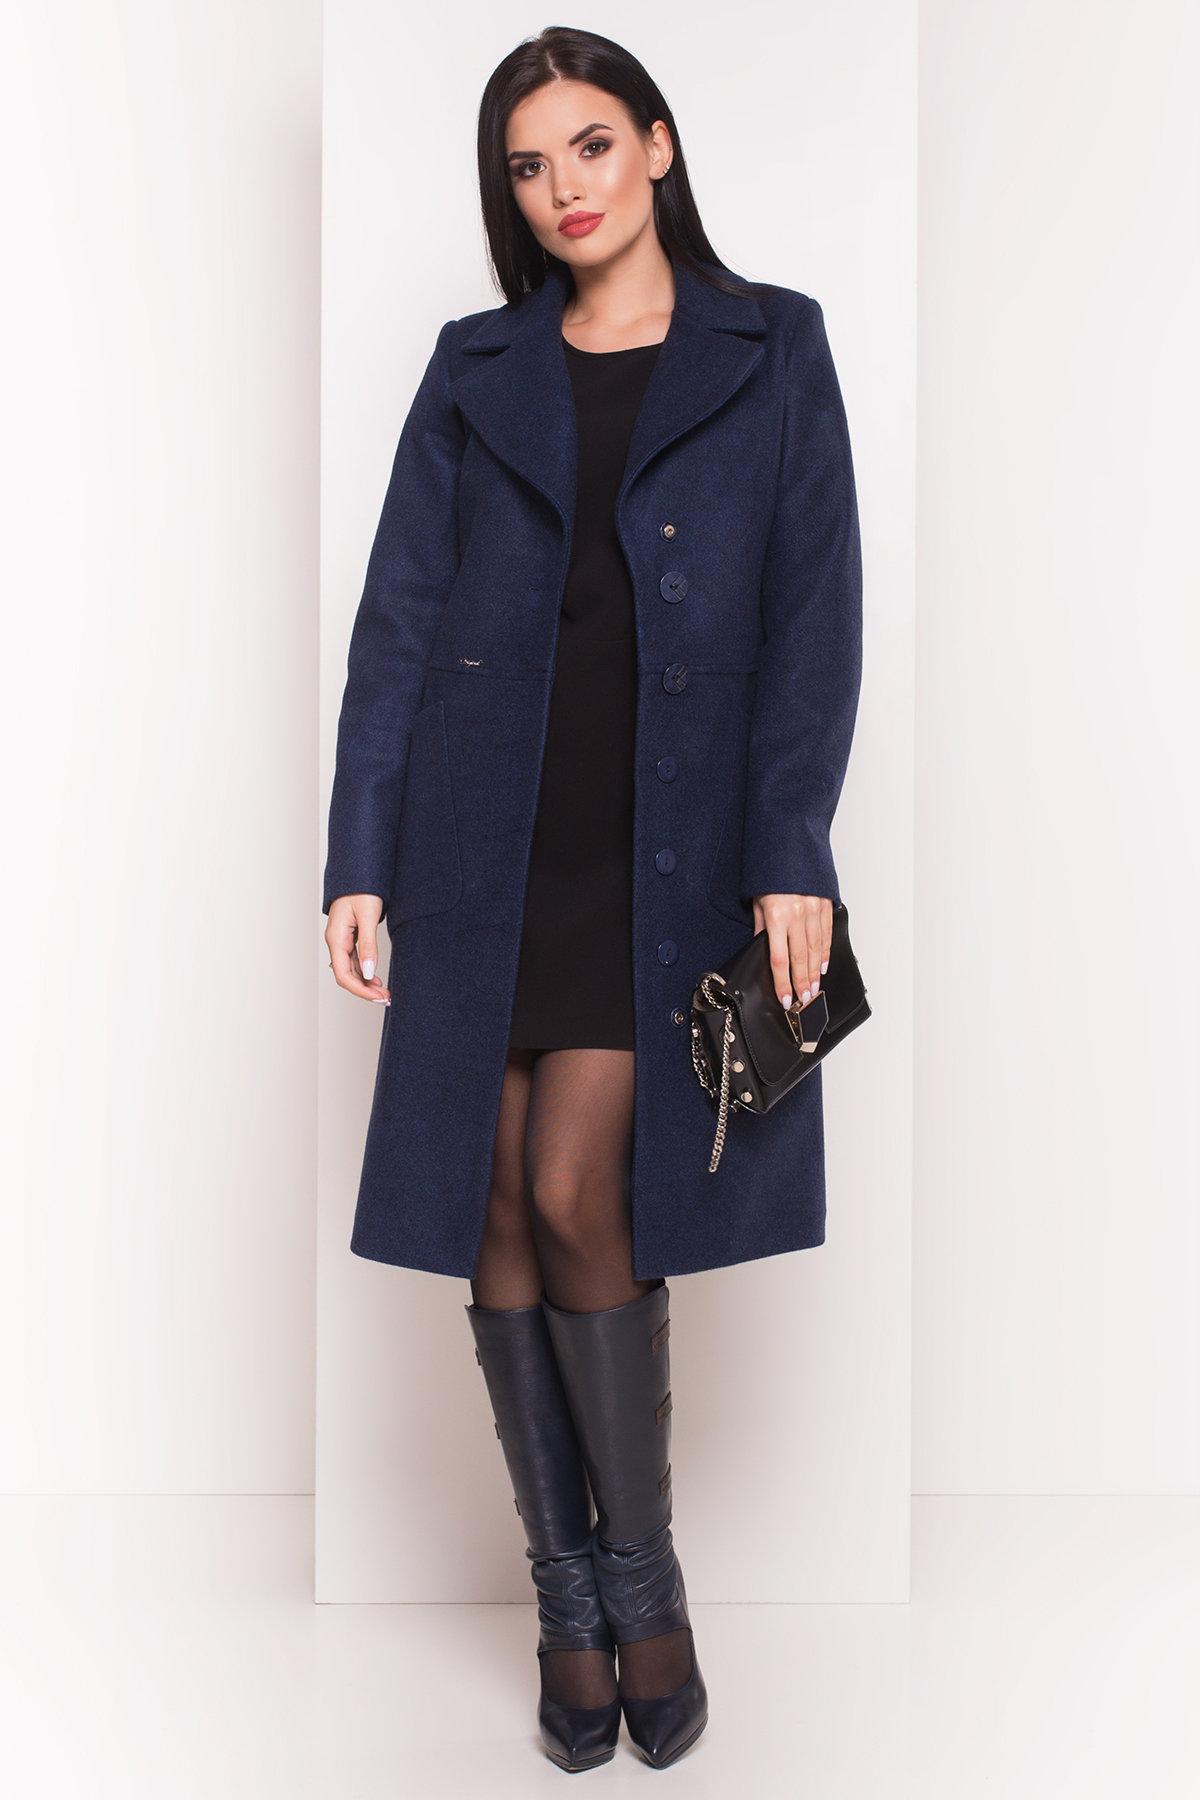 Пальто на весну-осень Габриэлла 4459 АРТ. 36662 Цвет: Темно-синий 17 - фото 3, интернет магазин tm-modus.ru